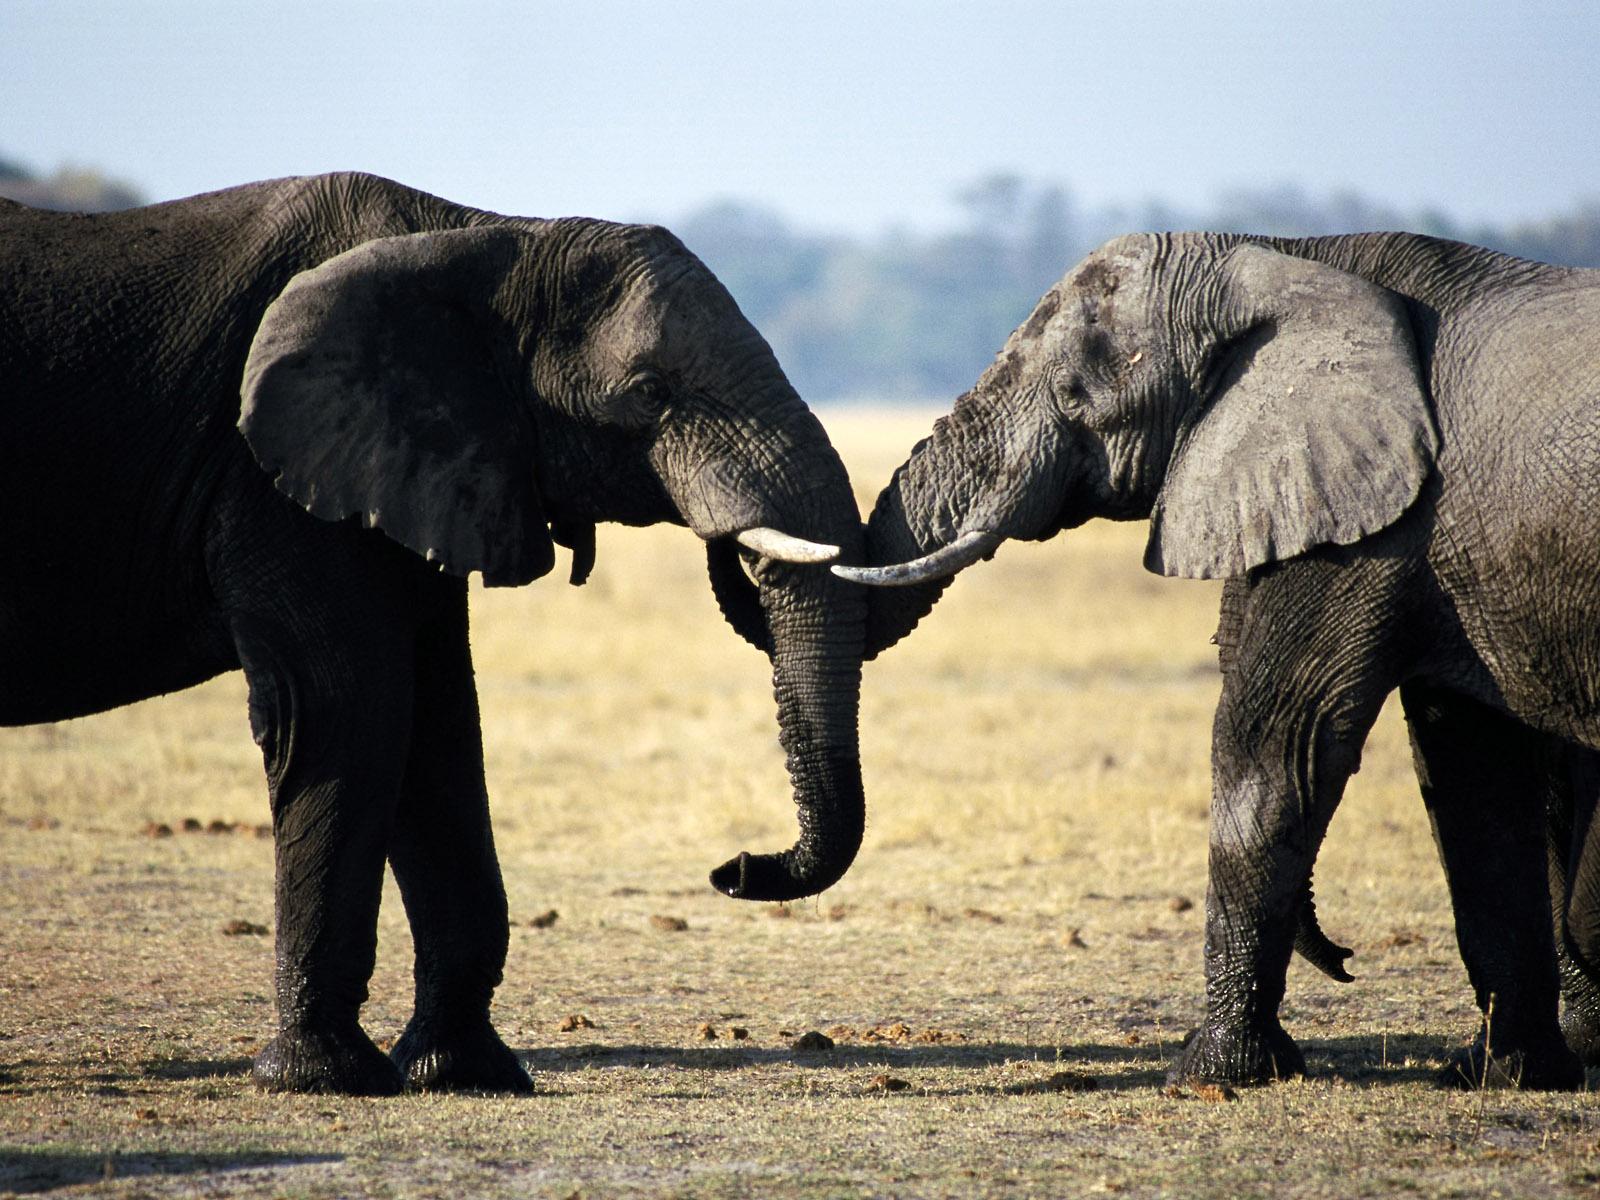 elephants wallpapers world - photo #12